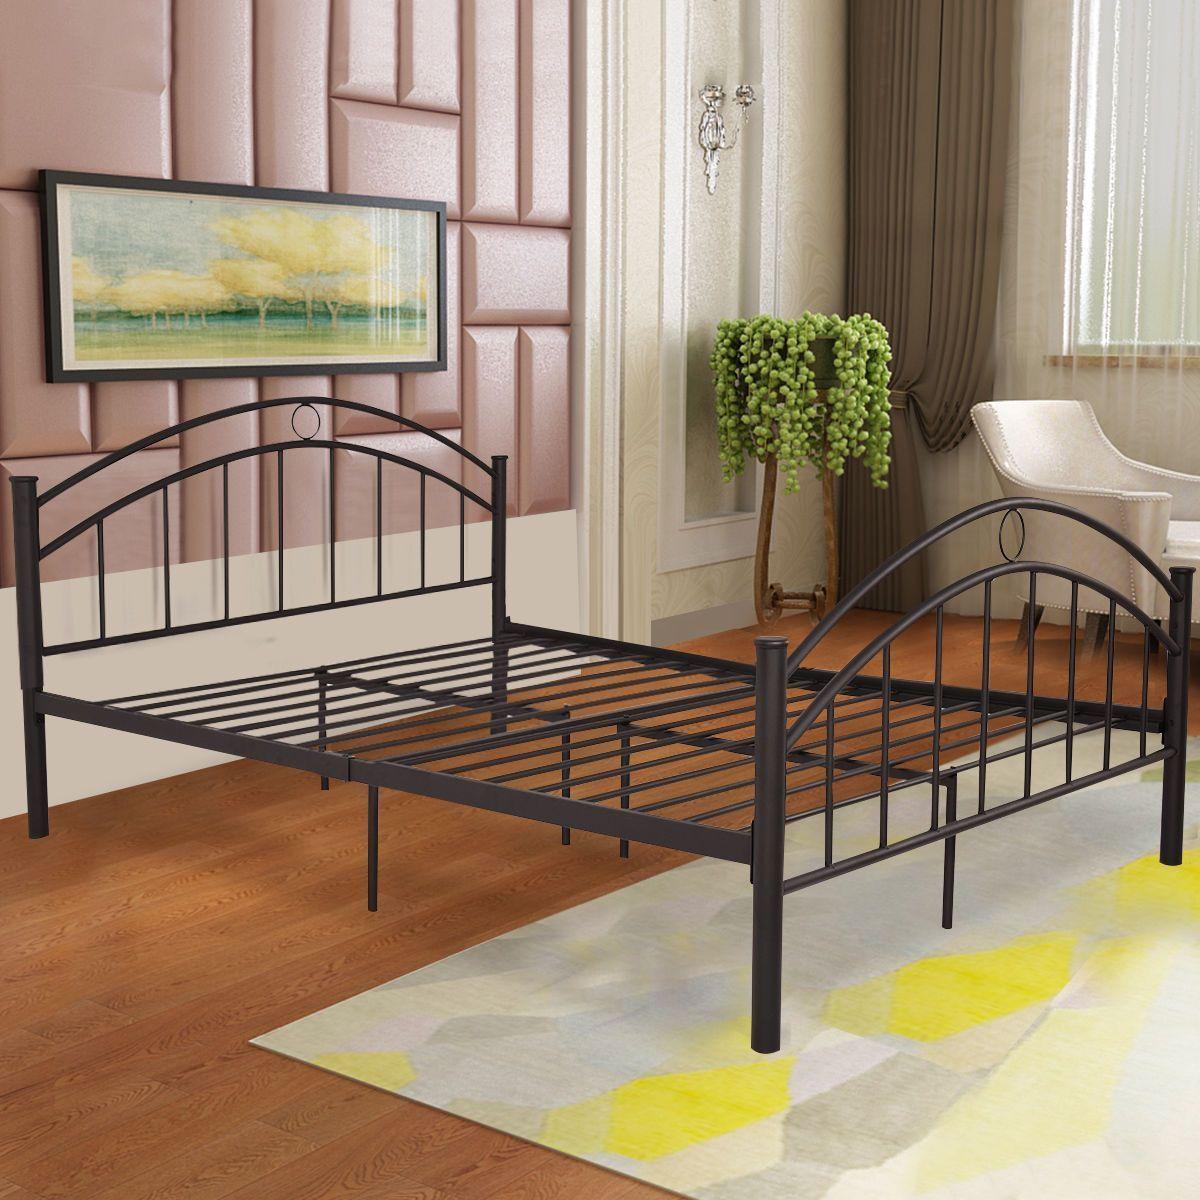 Best Black Queen Size Metal Frame Bed Mattress With Heardboarder Modern Bedroom Furniture Steel 400 x 300